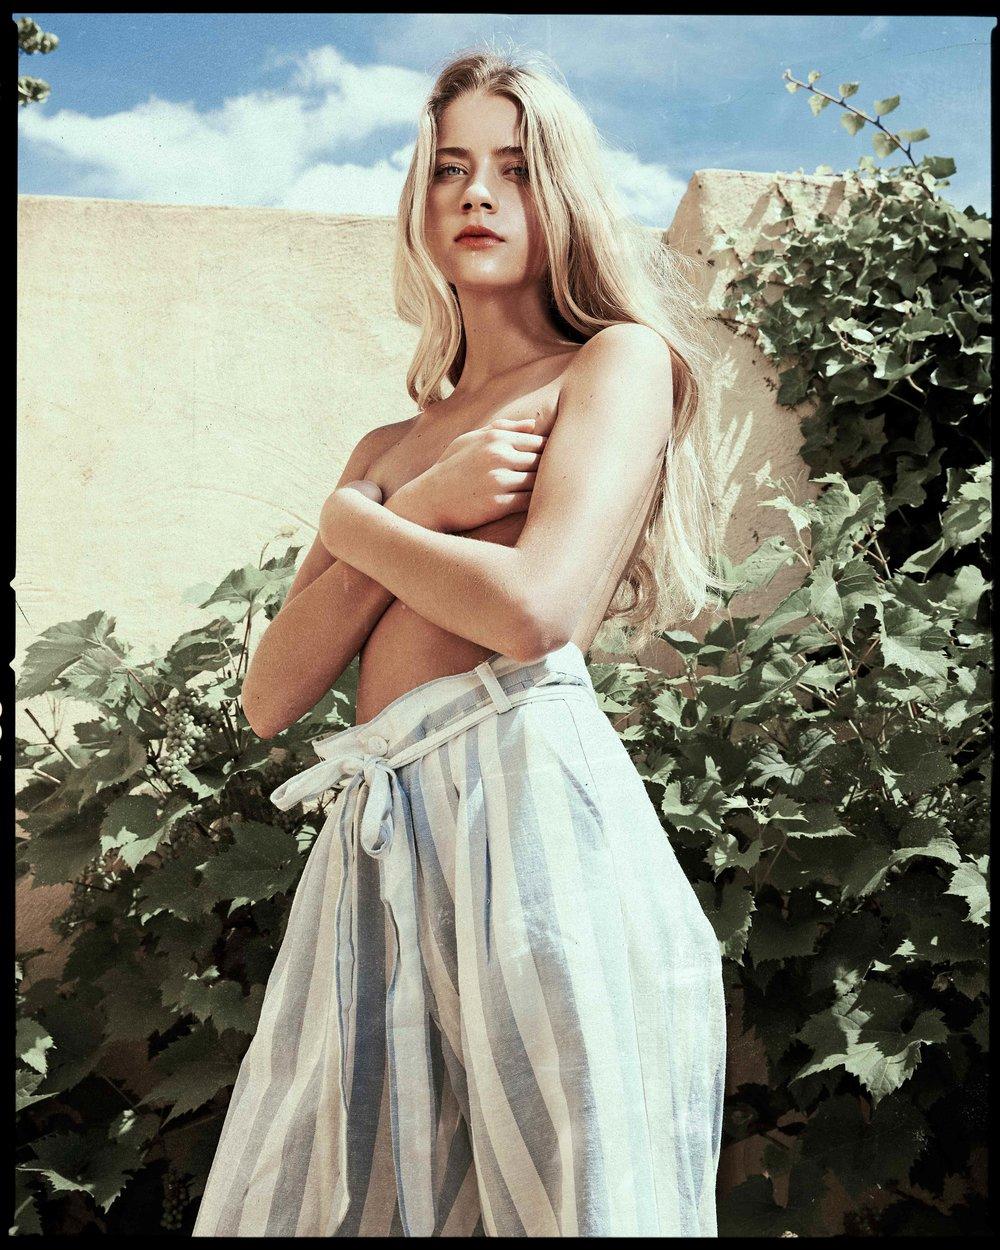 Woman_Angela_Huizer_011.jpg